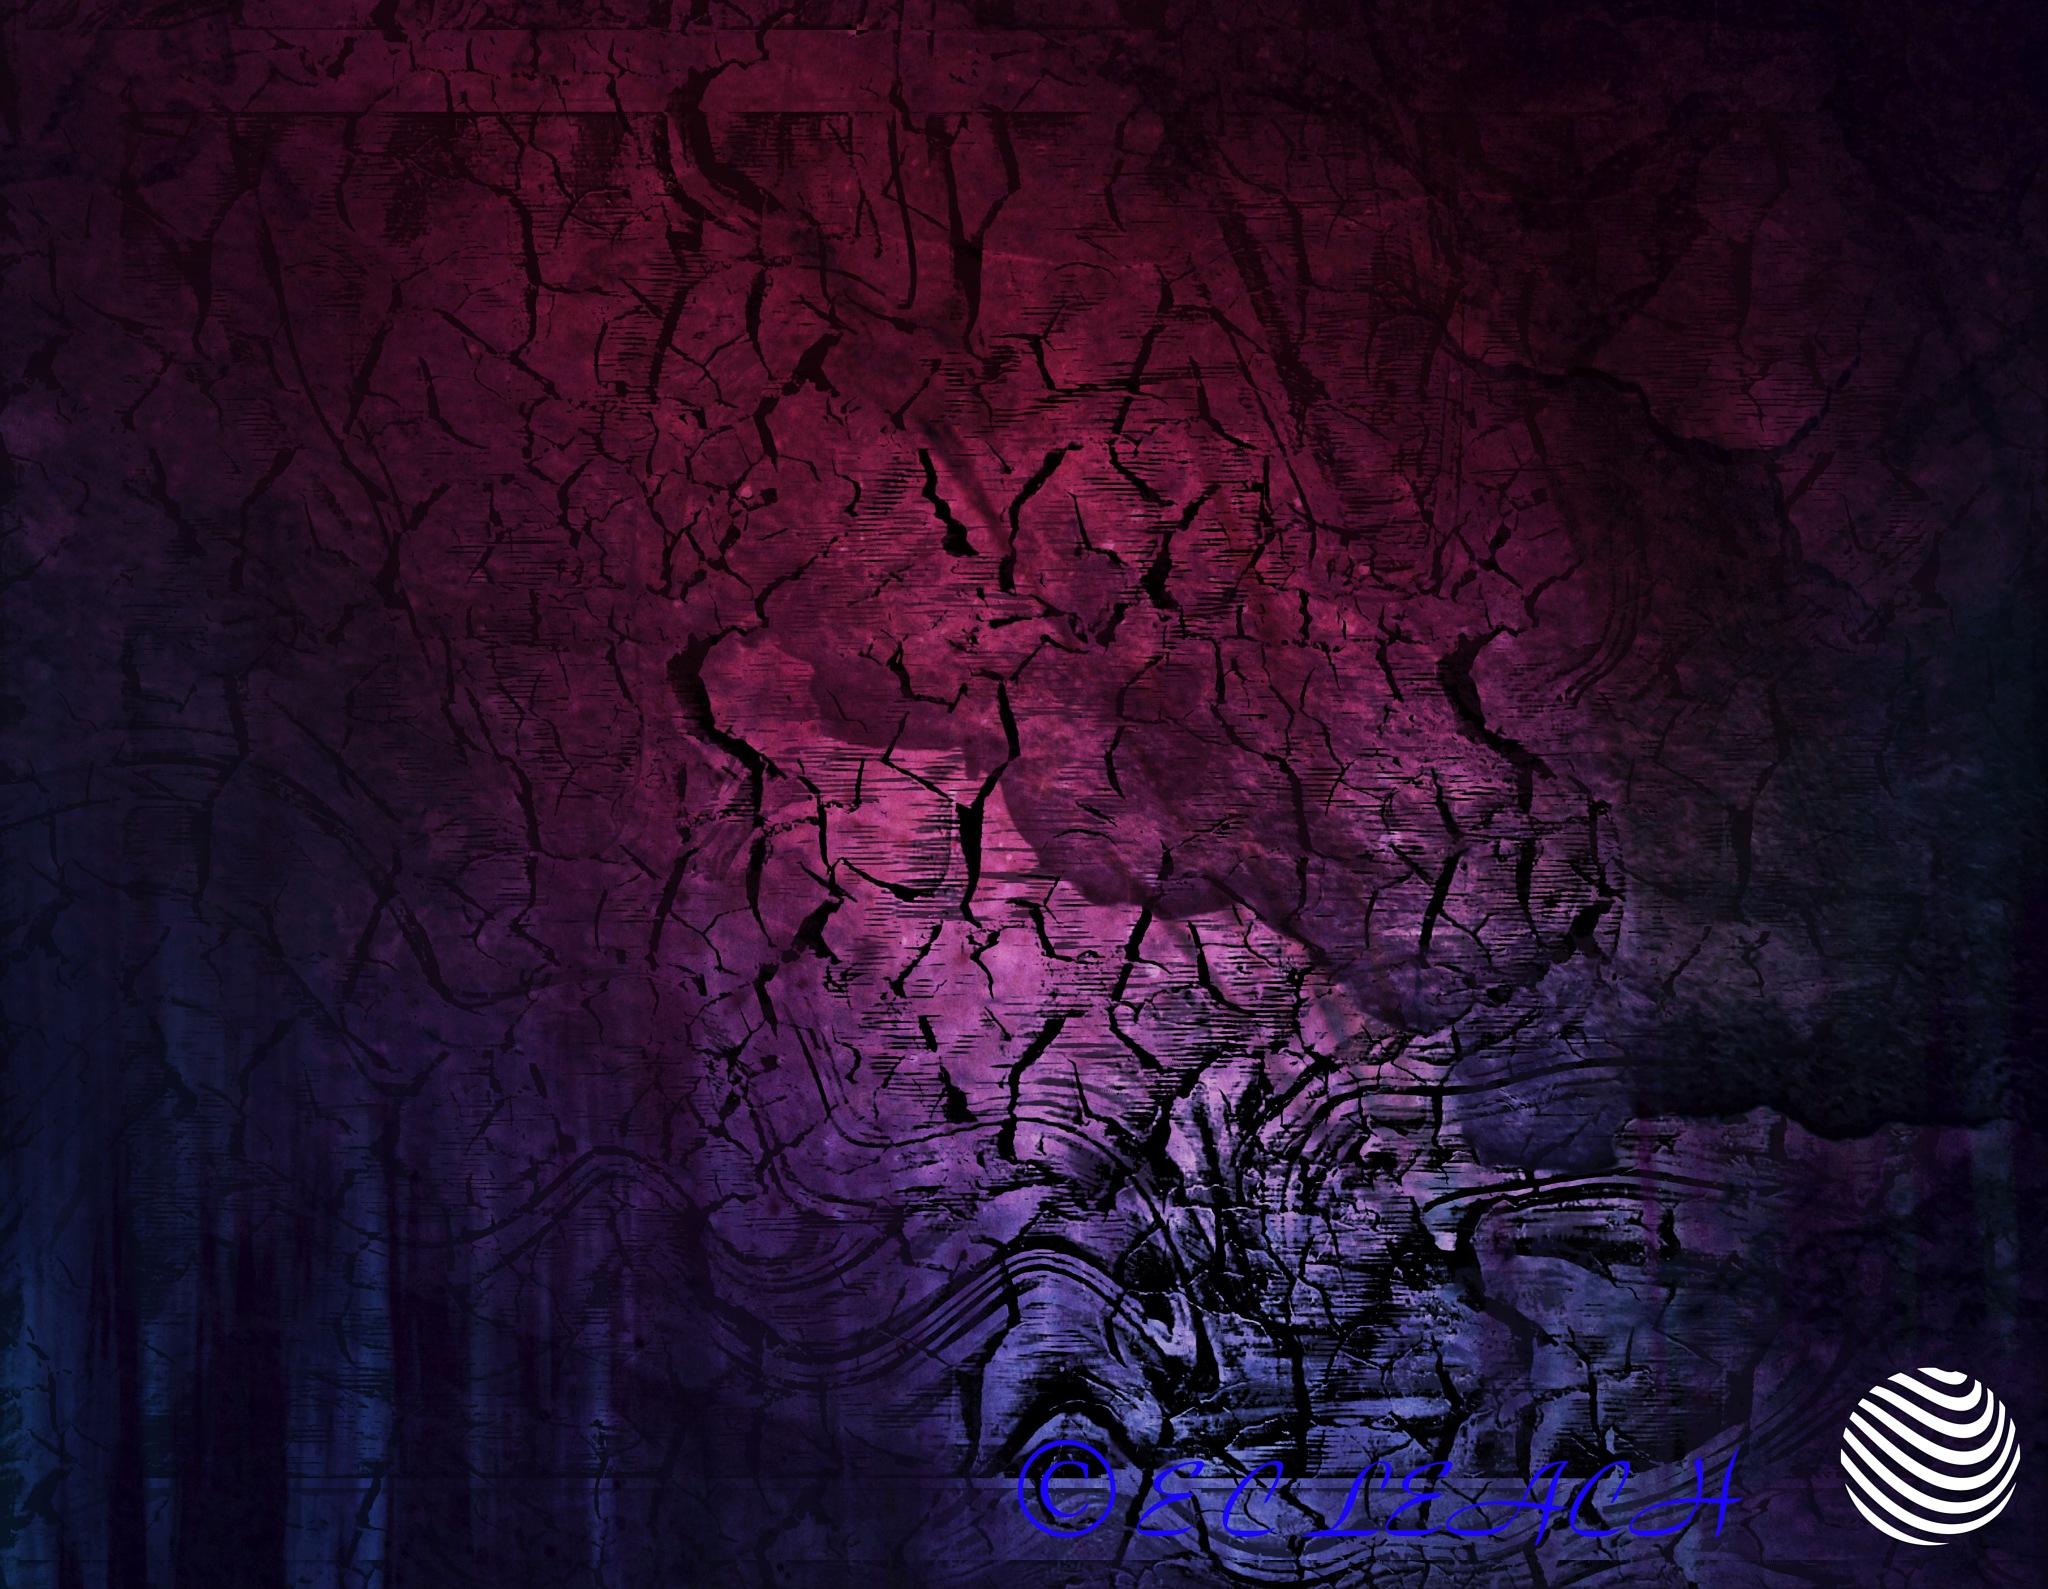 Abstract by Elmer Leach